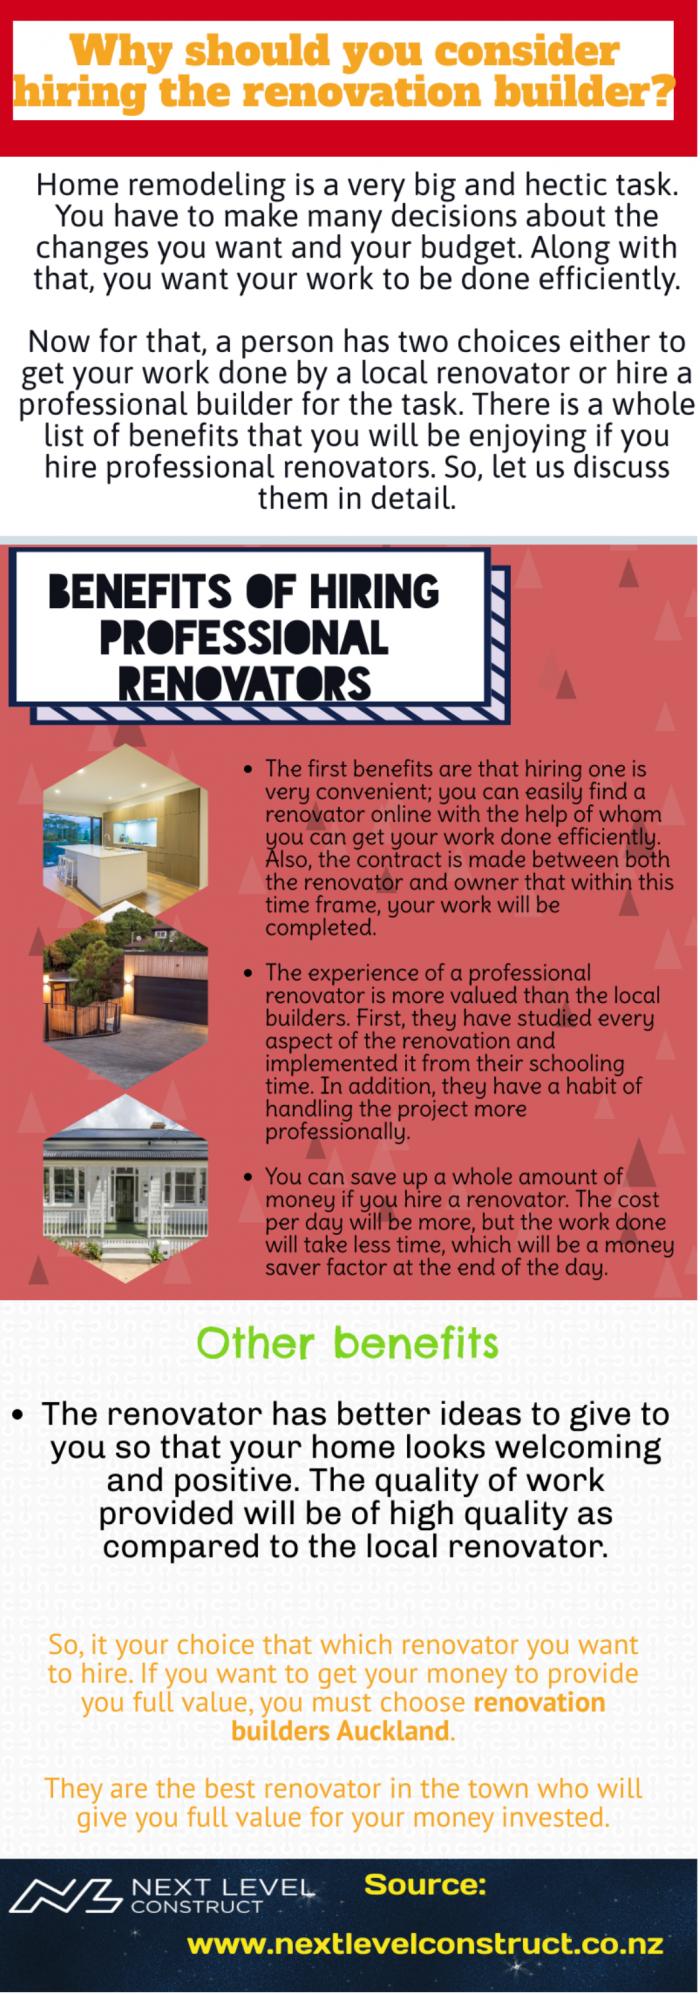 Benefits of hiring a renovation builder